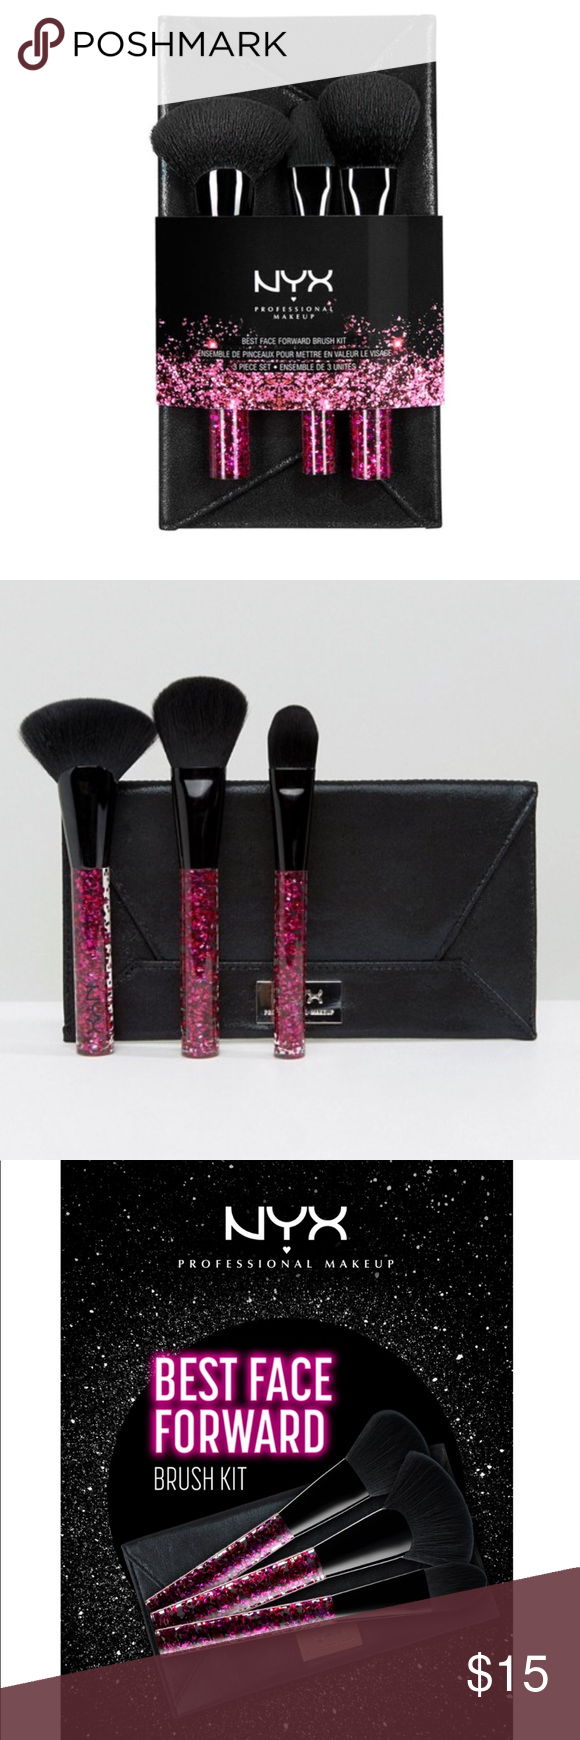 LAST ONE 💜 NYX best face forward brush kit & case